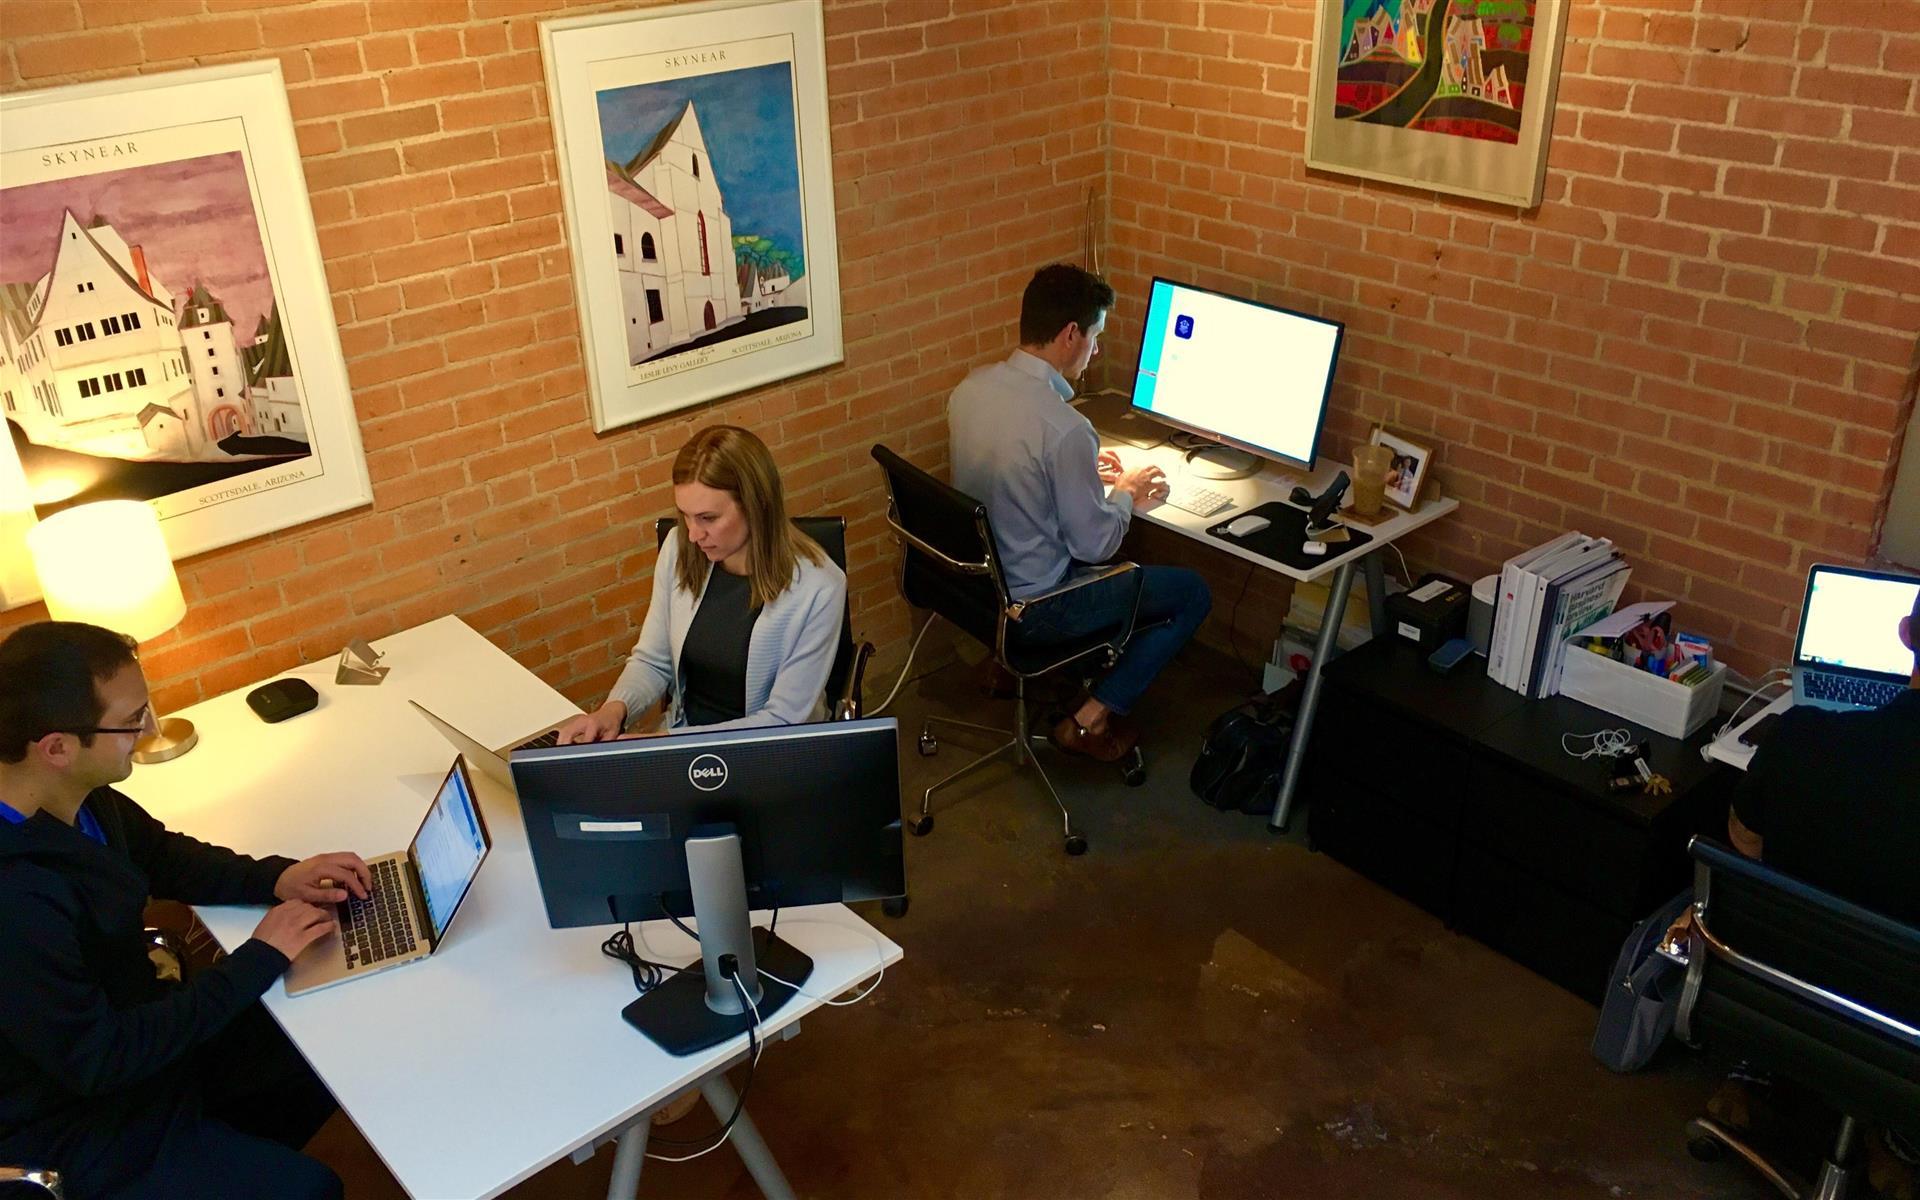 Dallas GeniusDen - Deep Ellum Downtown - Private Office for 4 people